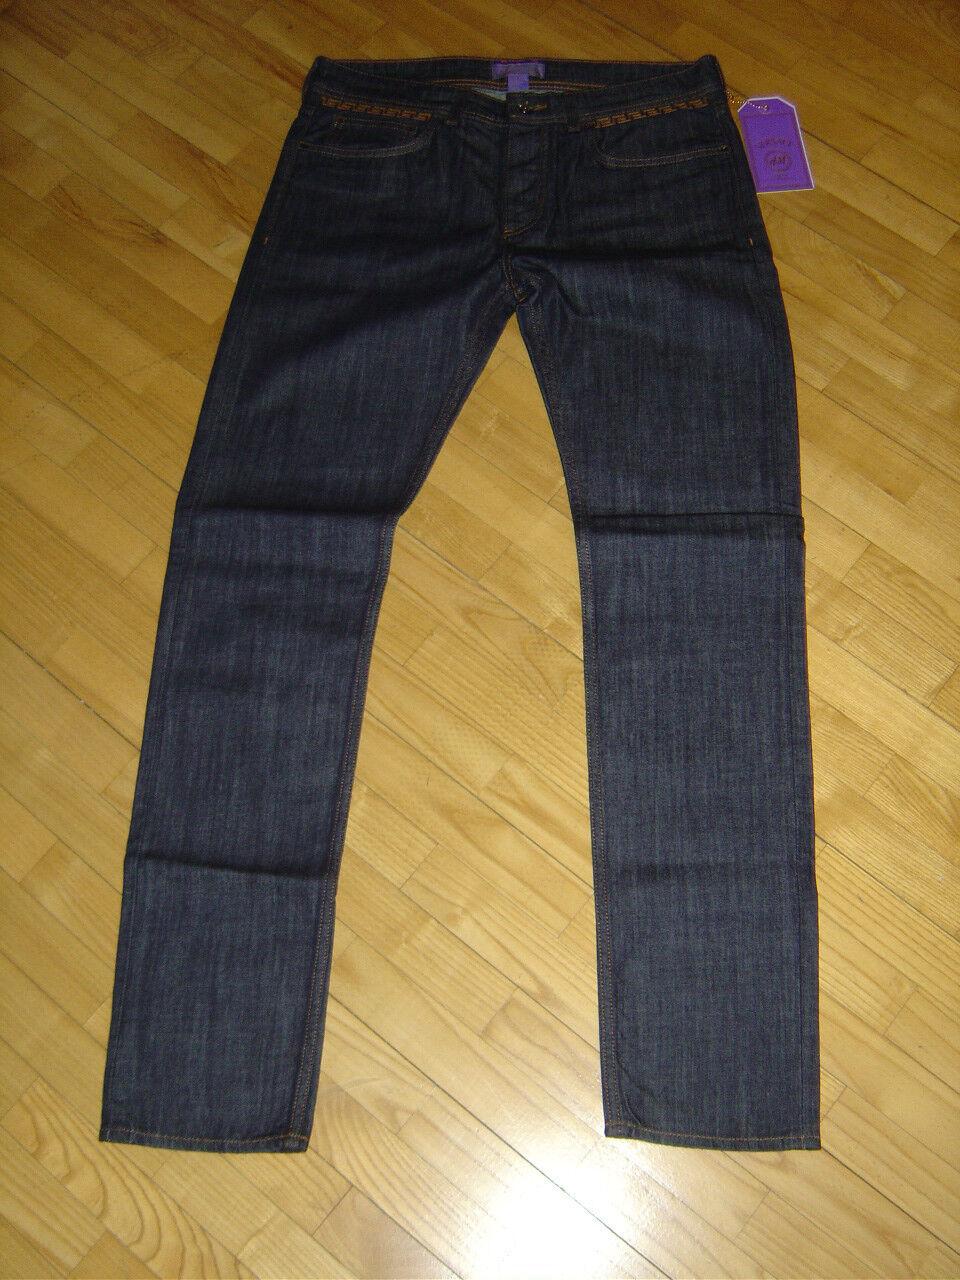 Versace for H&M Jeans Cruise Collection Pants Hose Größe Größe W34 neu new